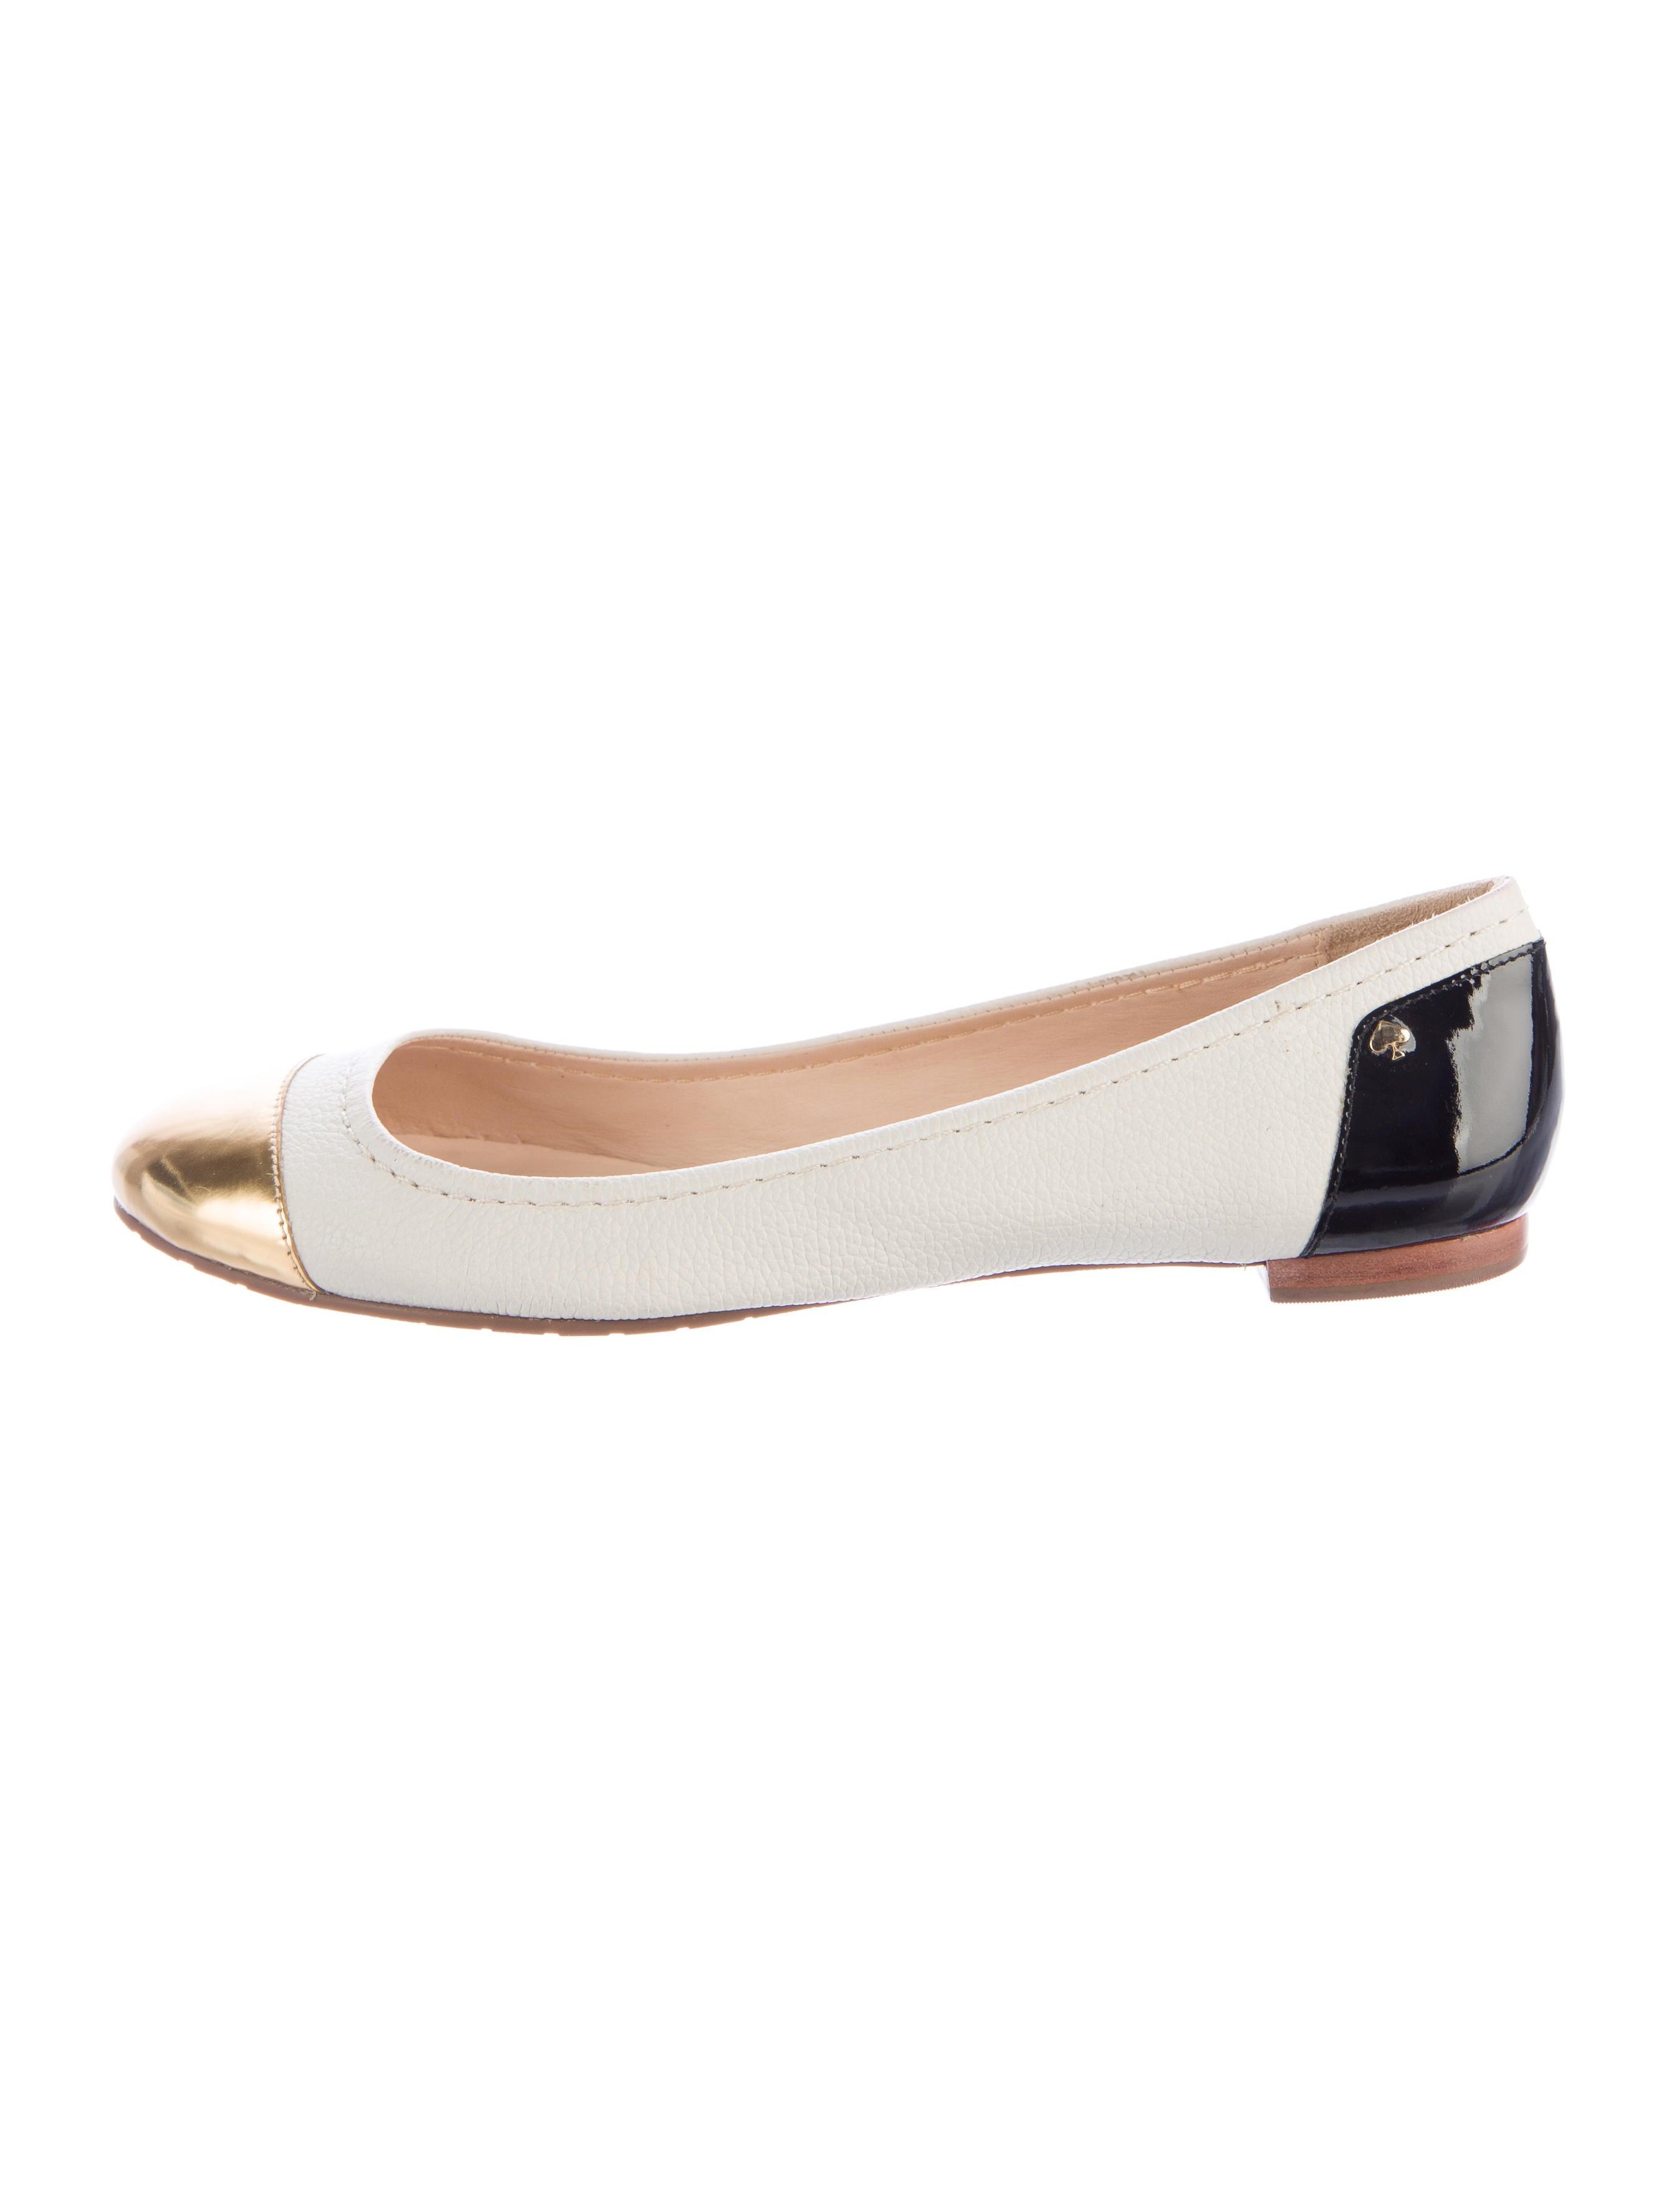 Kate spade new york leather cap toe flats shoes for Kate spade new york flats